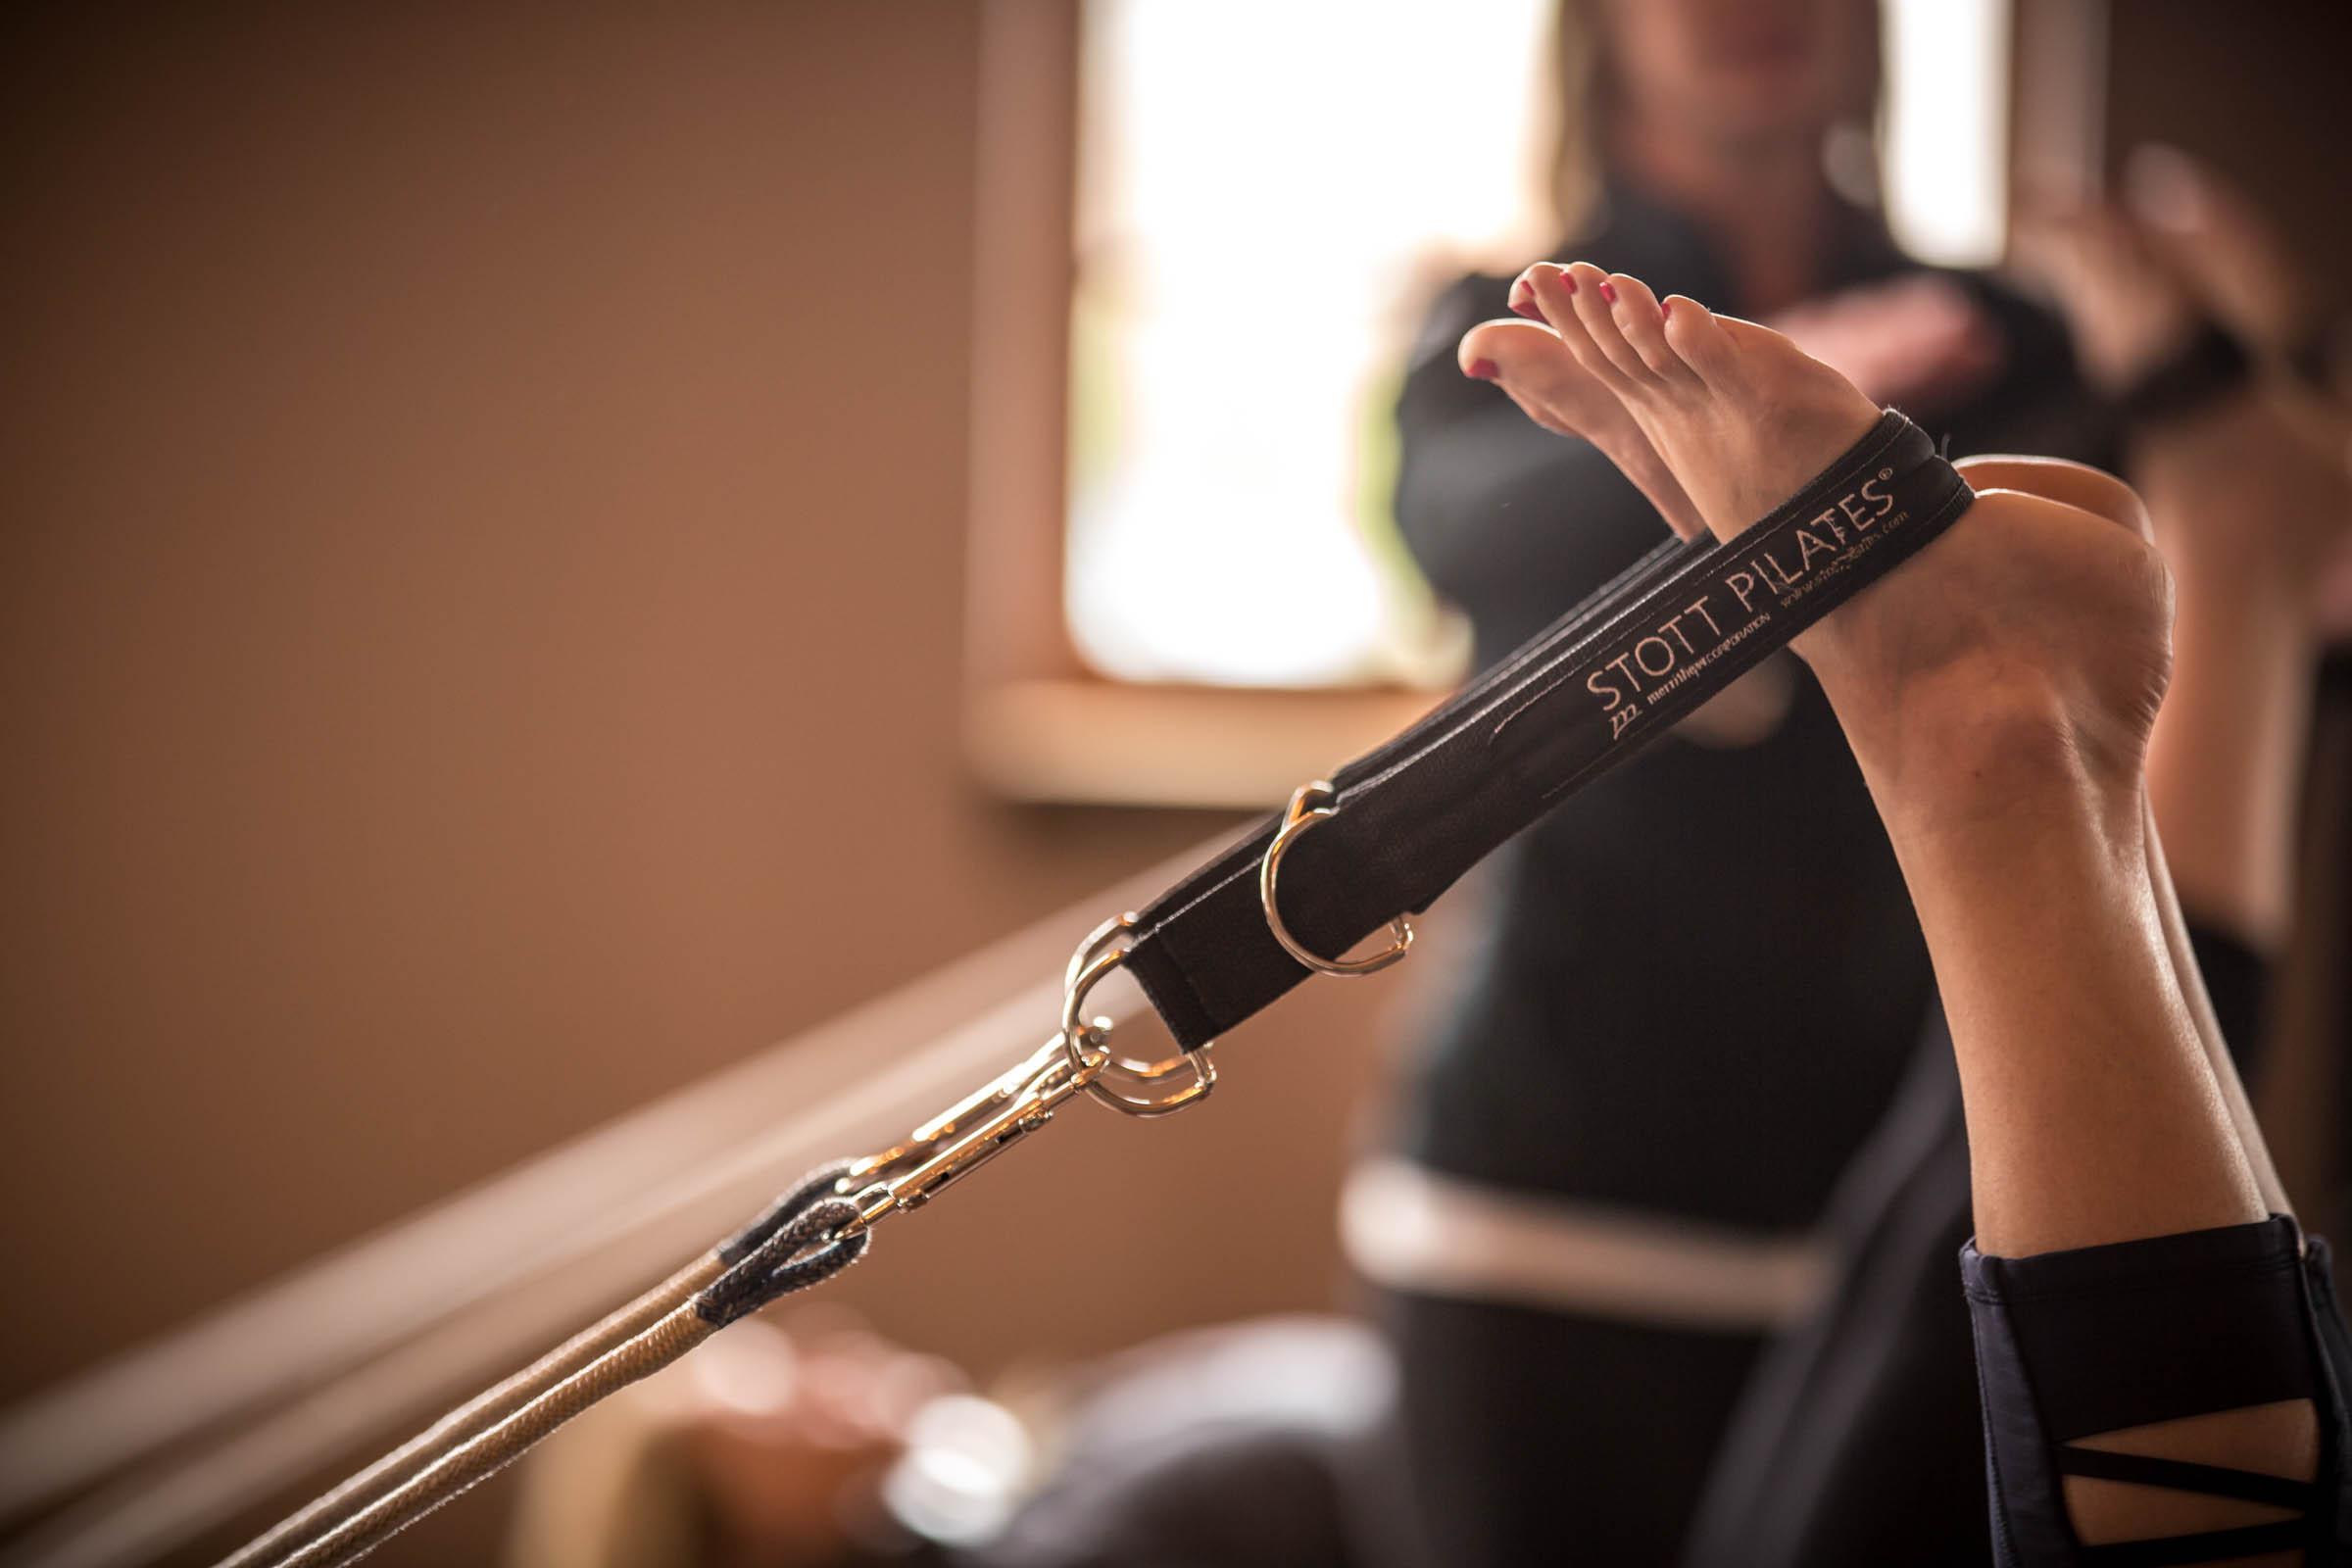 be_fitness_instructors_delafield_0241.jpg